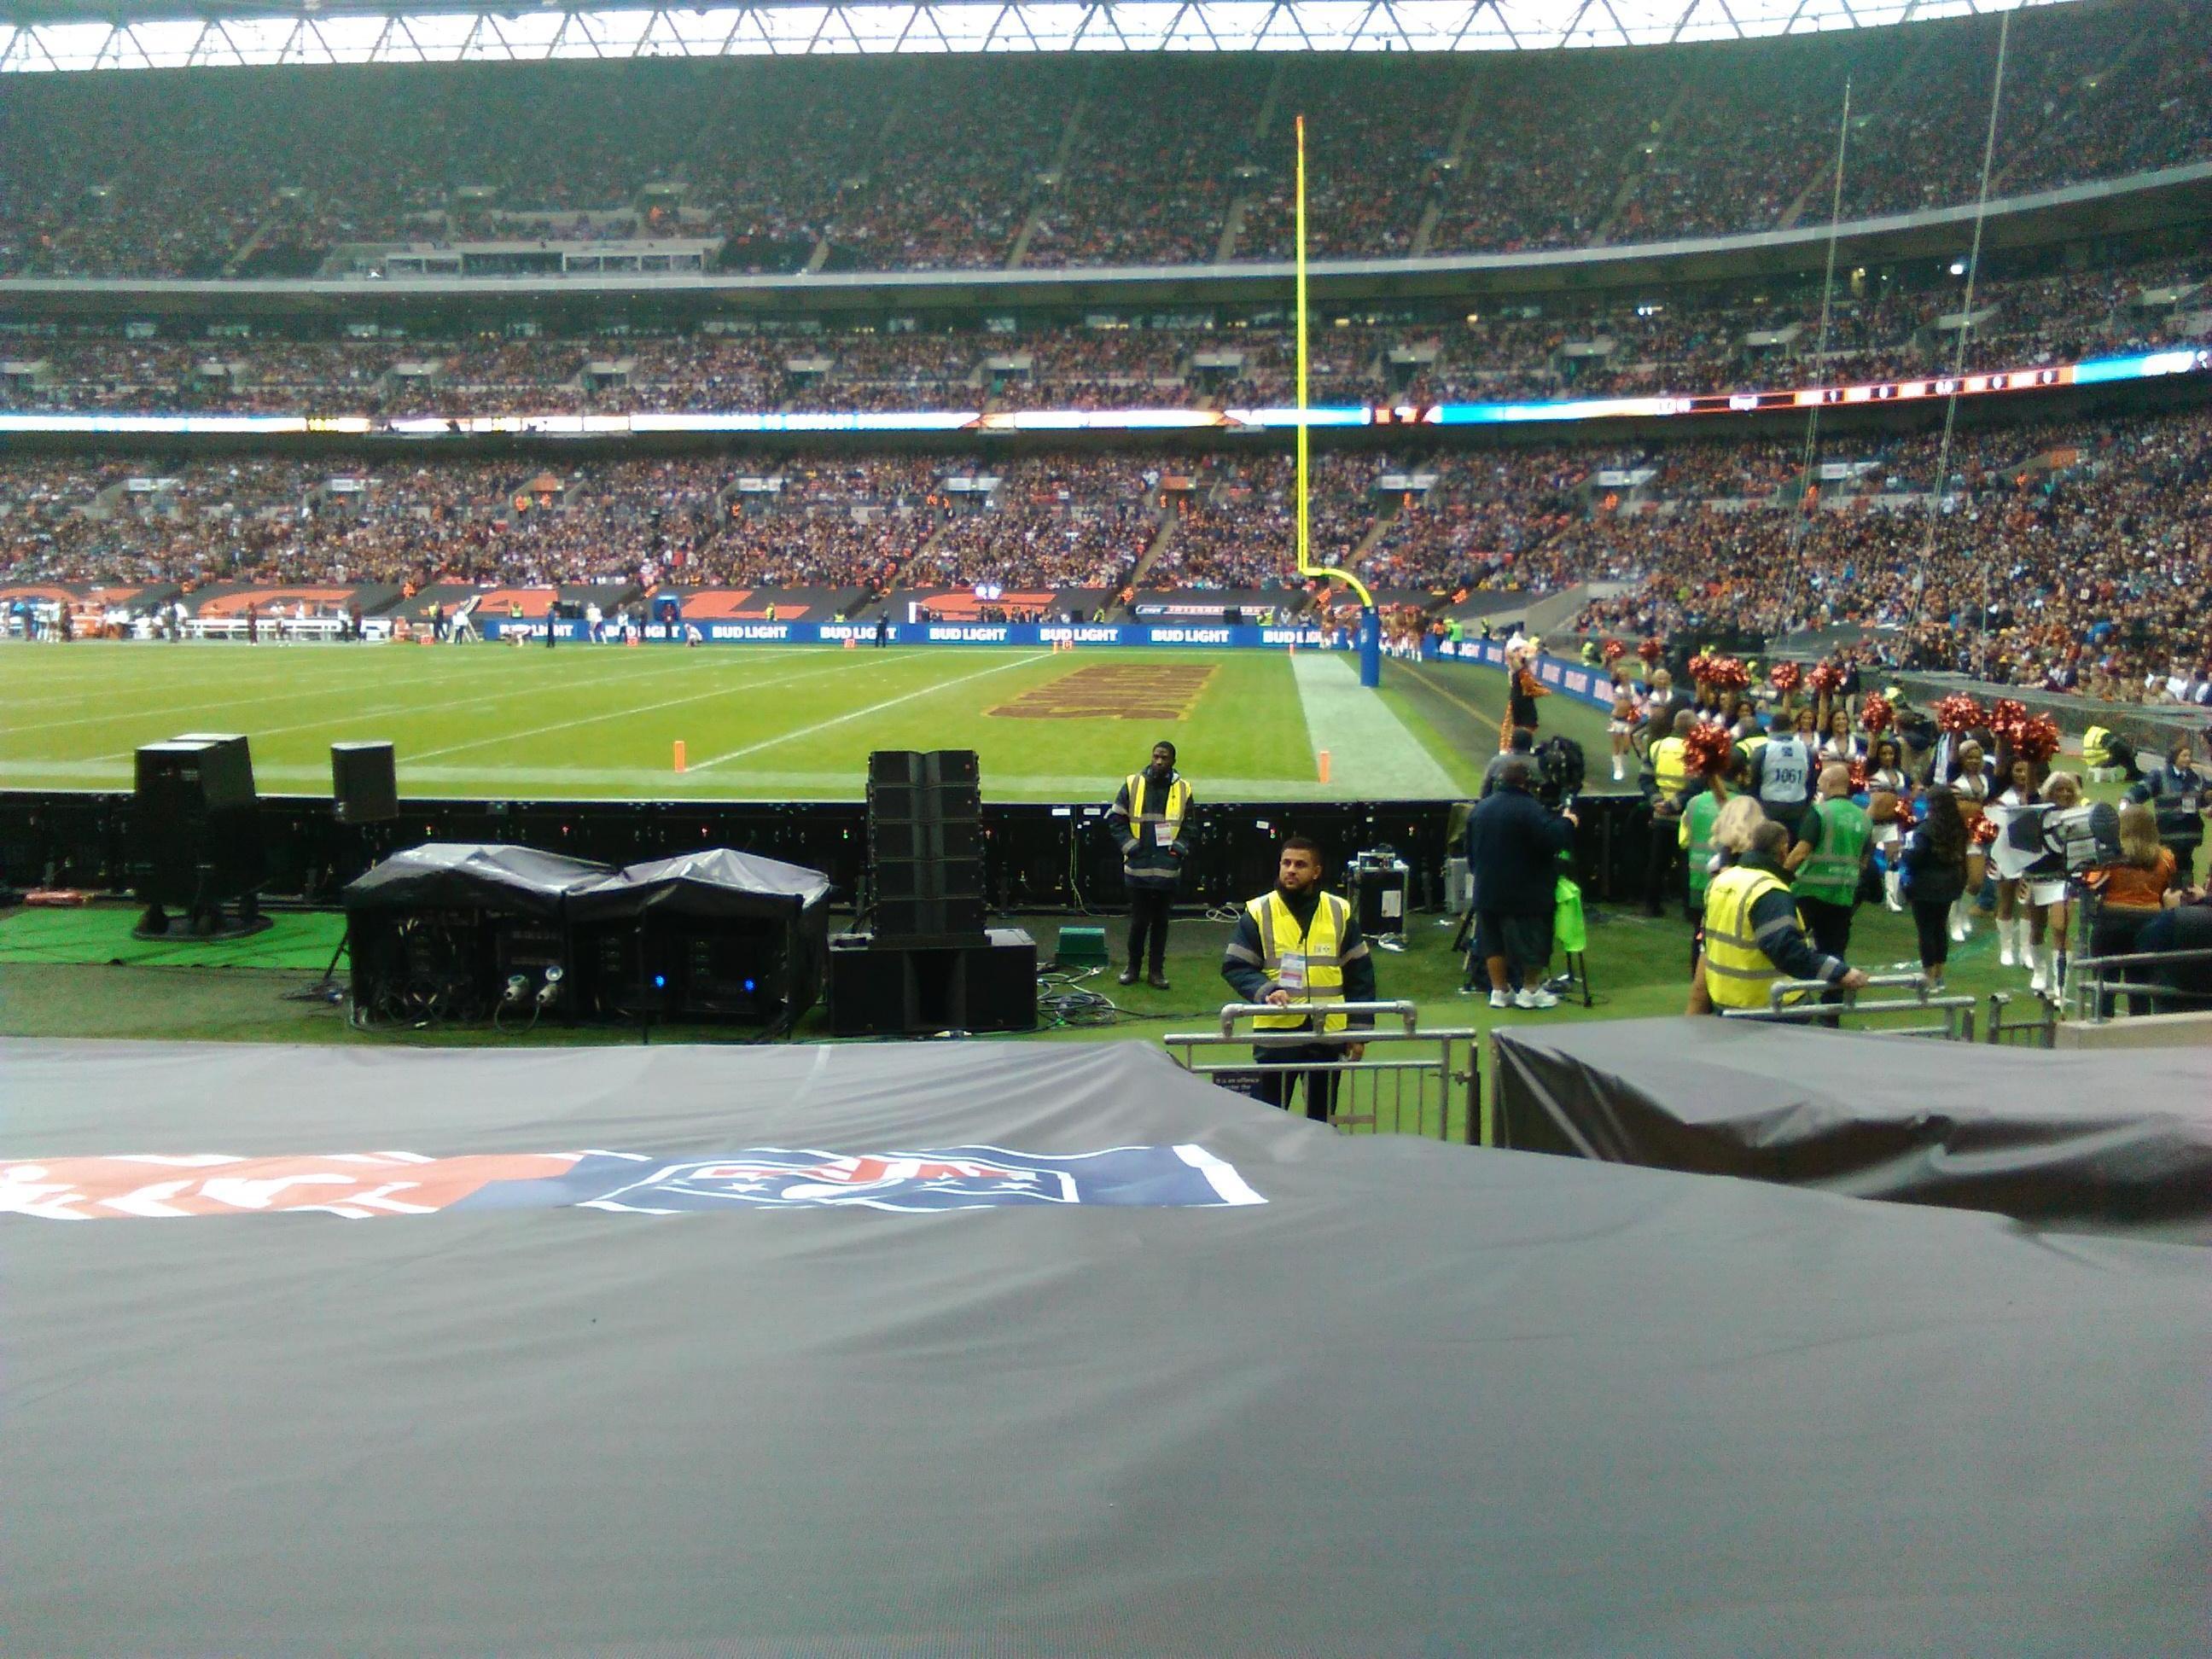 Wembley Stadium Section 140 Row 11 Seat 202